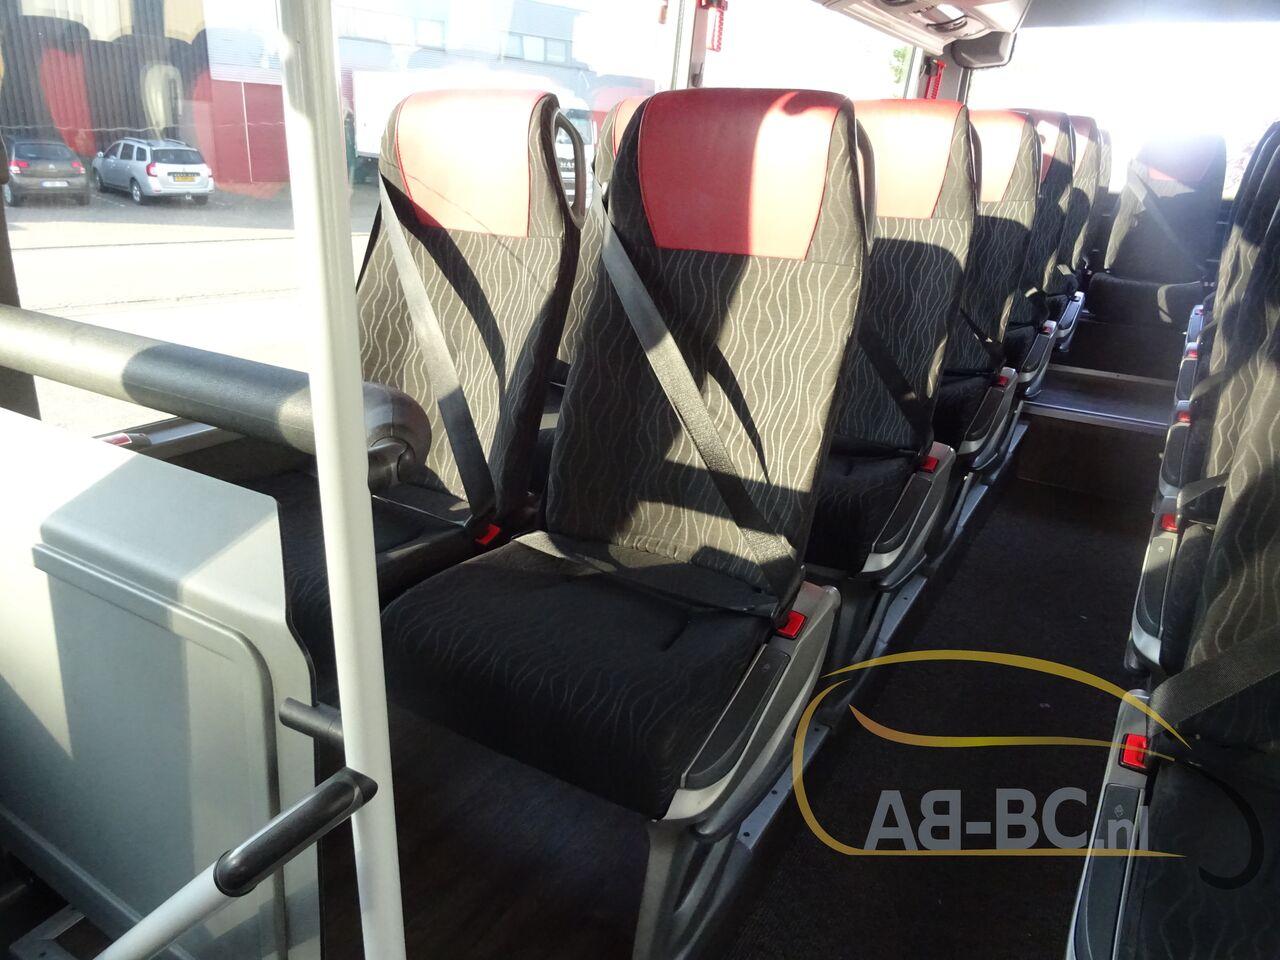 coach-bus-SETRA-S415H-52-Seats-EURO-6-Liftbus---1630913452350159462_big_672b83861a3e21248272fdf4c8e3d176--21070517141280735500